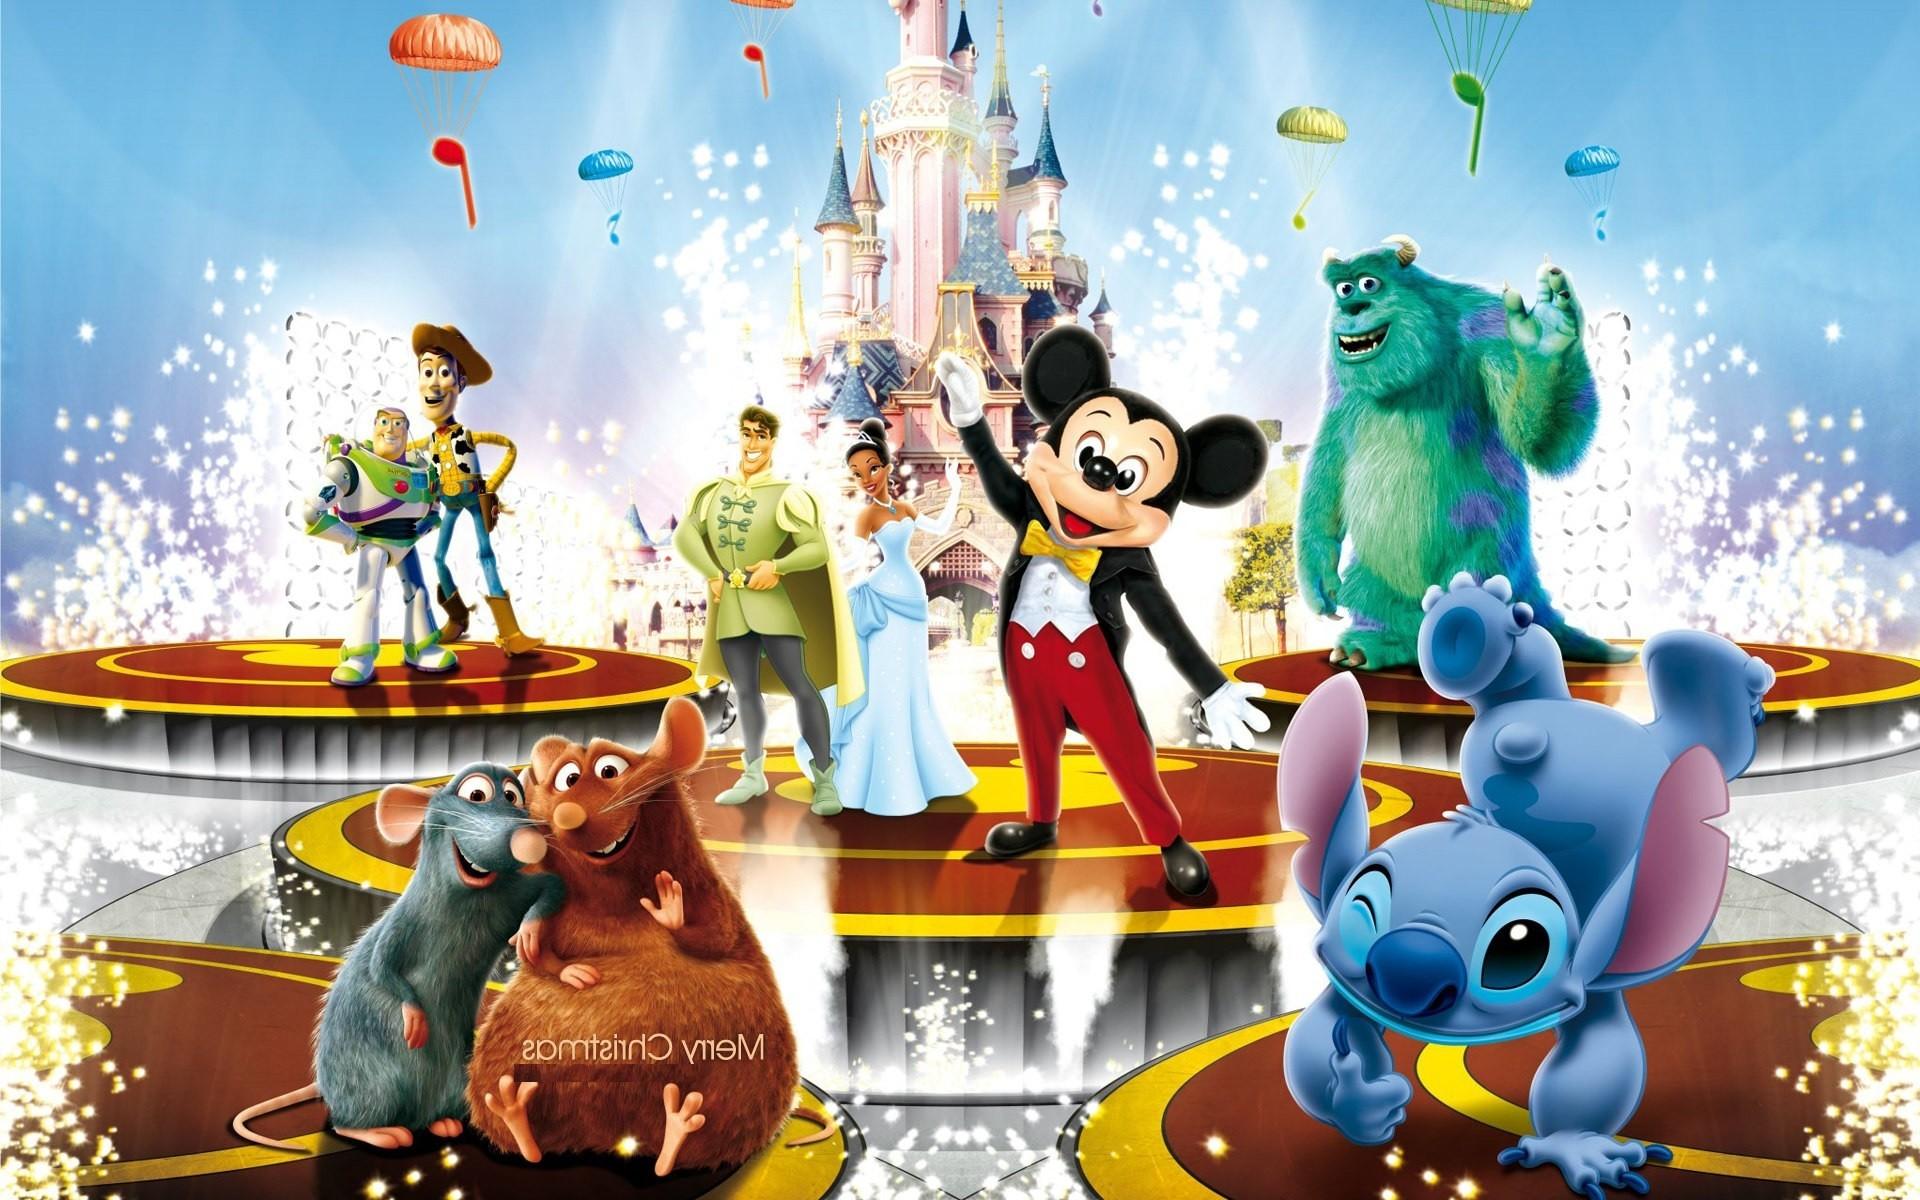 Disney Character Wallpaper 57 Images